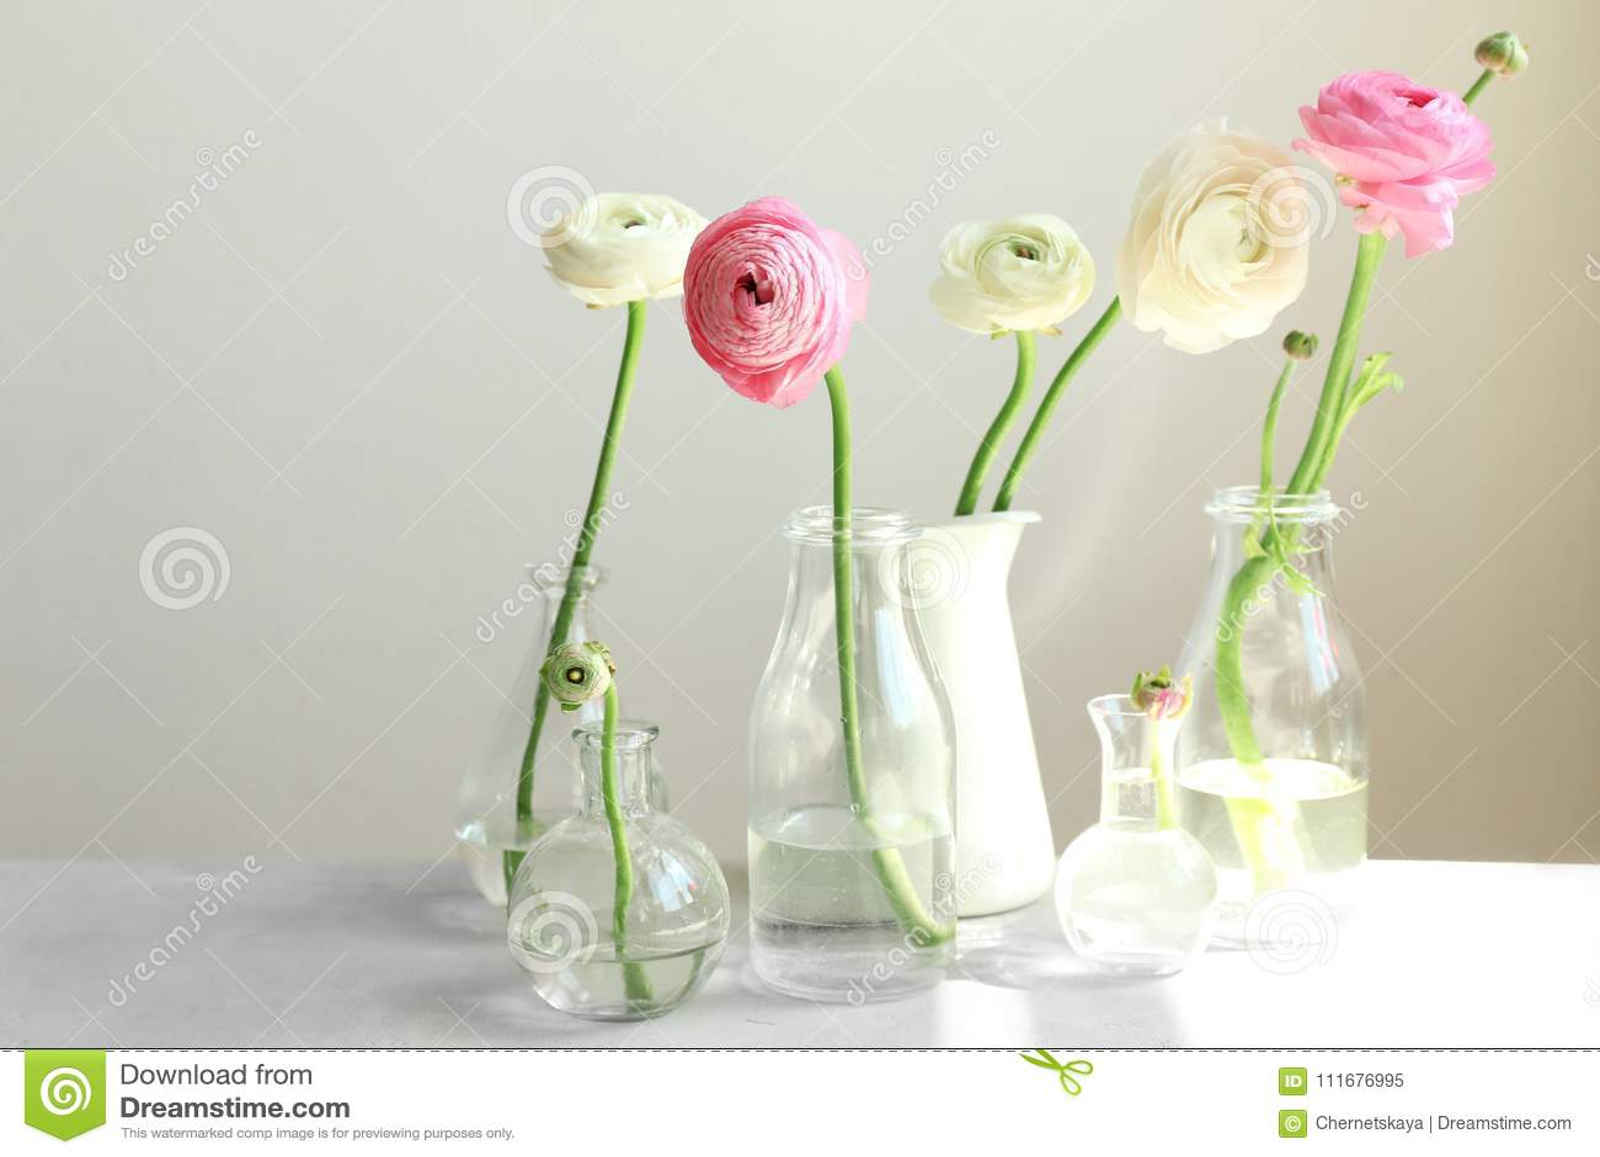 Glass vases with beautiful fresh ranunculus flowers stock image download glass vases with beautiful fresh ranunculus flowers stock image image of natural garden izmirmasajfo